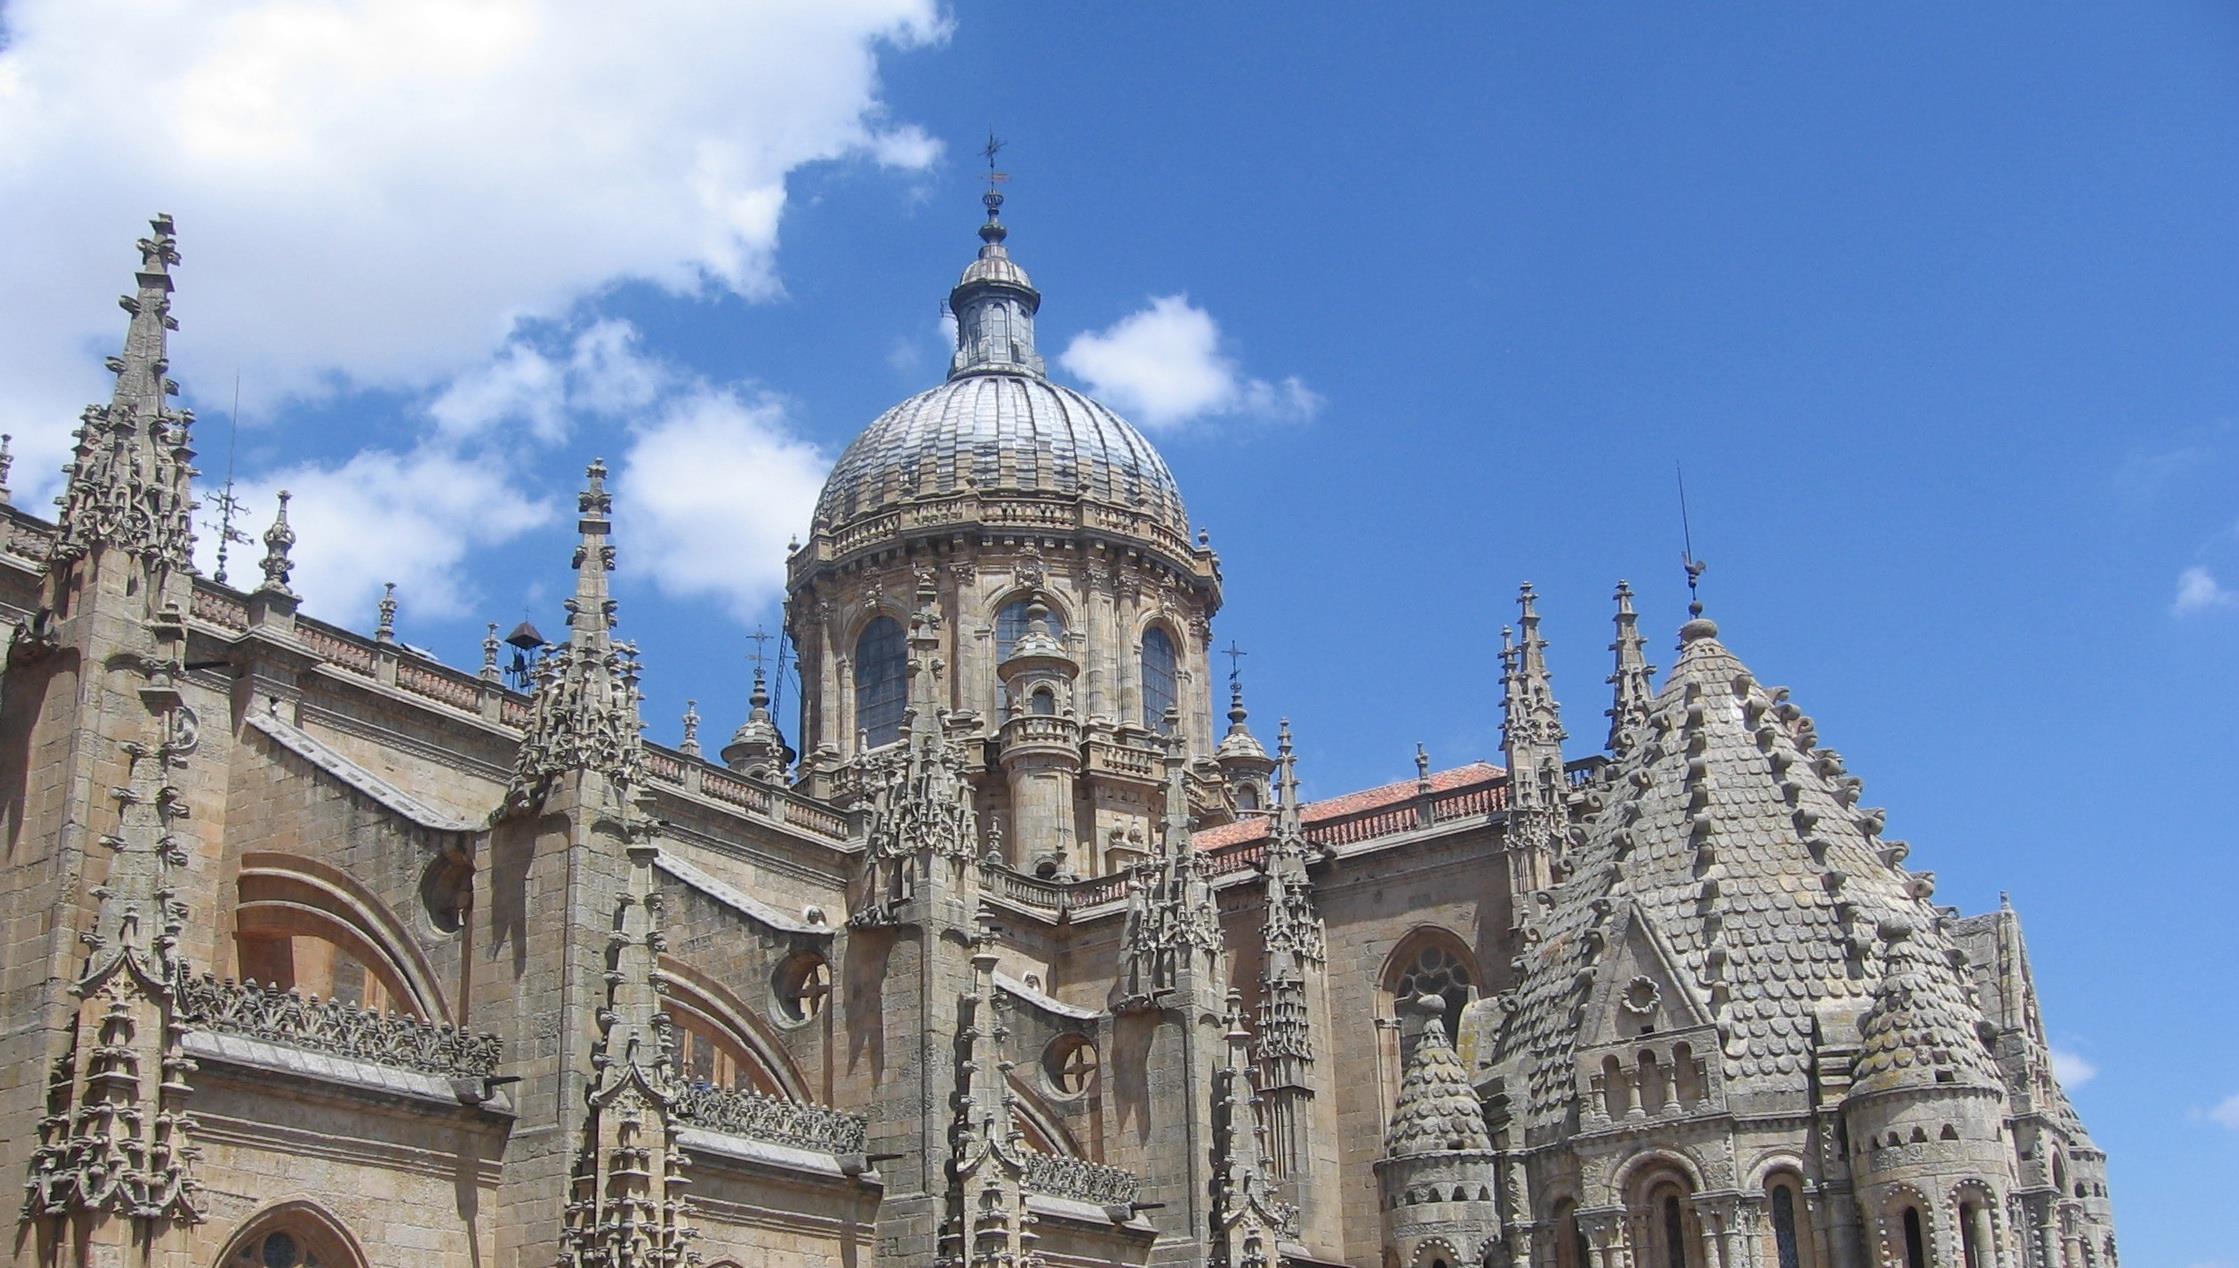 Tour-a-las-Torres-de-la-Catedral-de-Salamanca-10